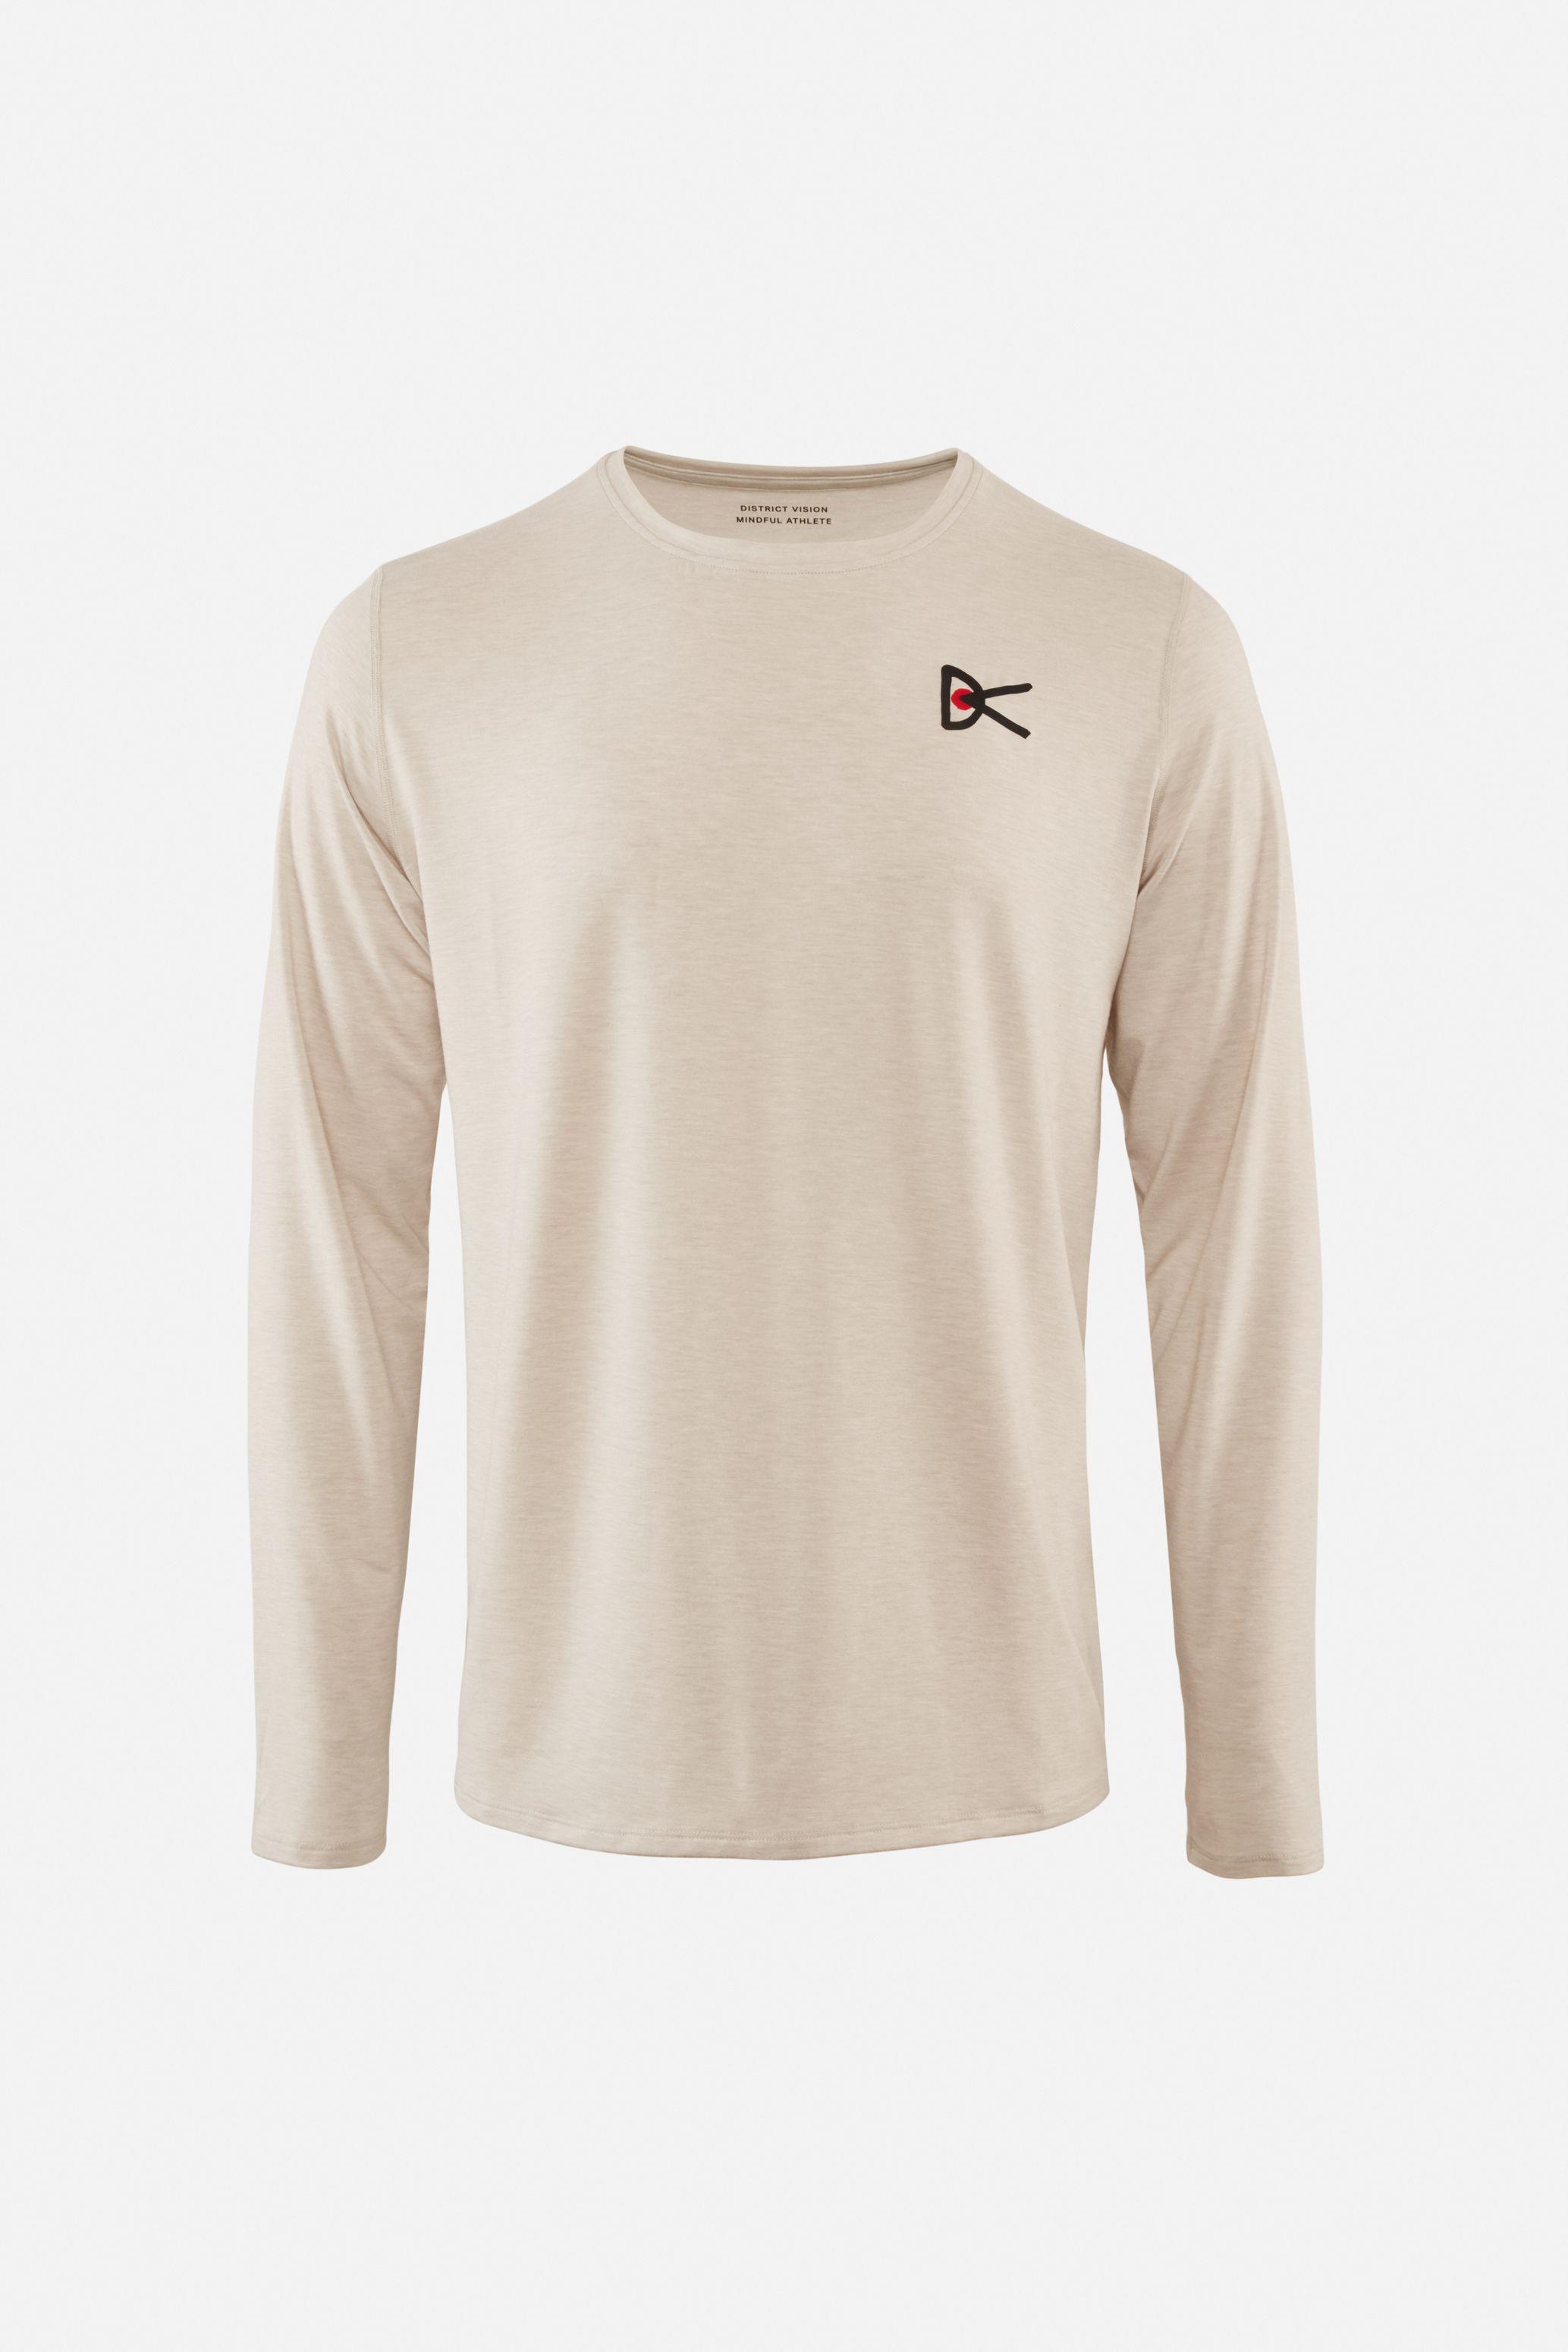 Tadasana Long Sleeve T-Shirt, Oatmeal